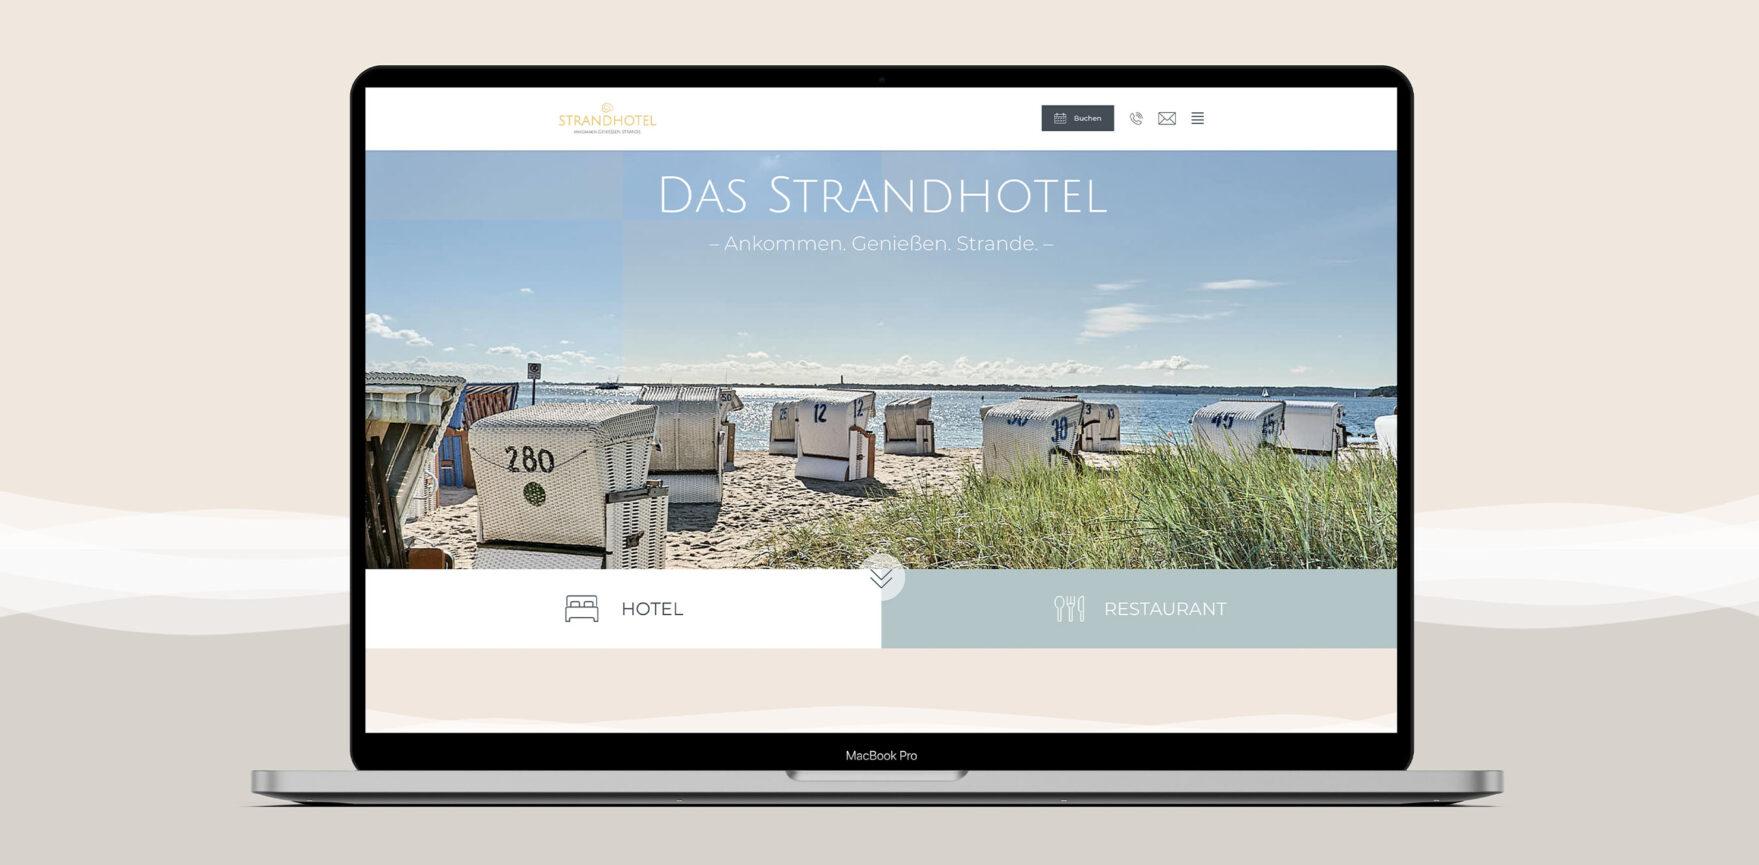 Offener Laptop mit Strandhotel Website